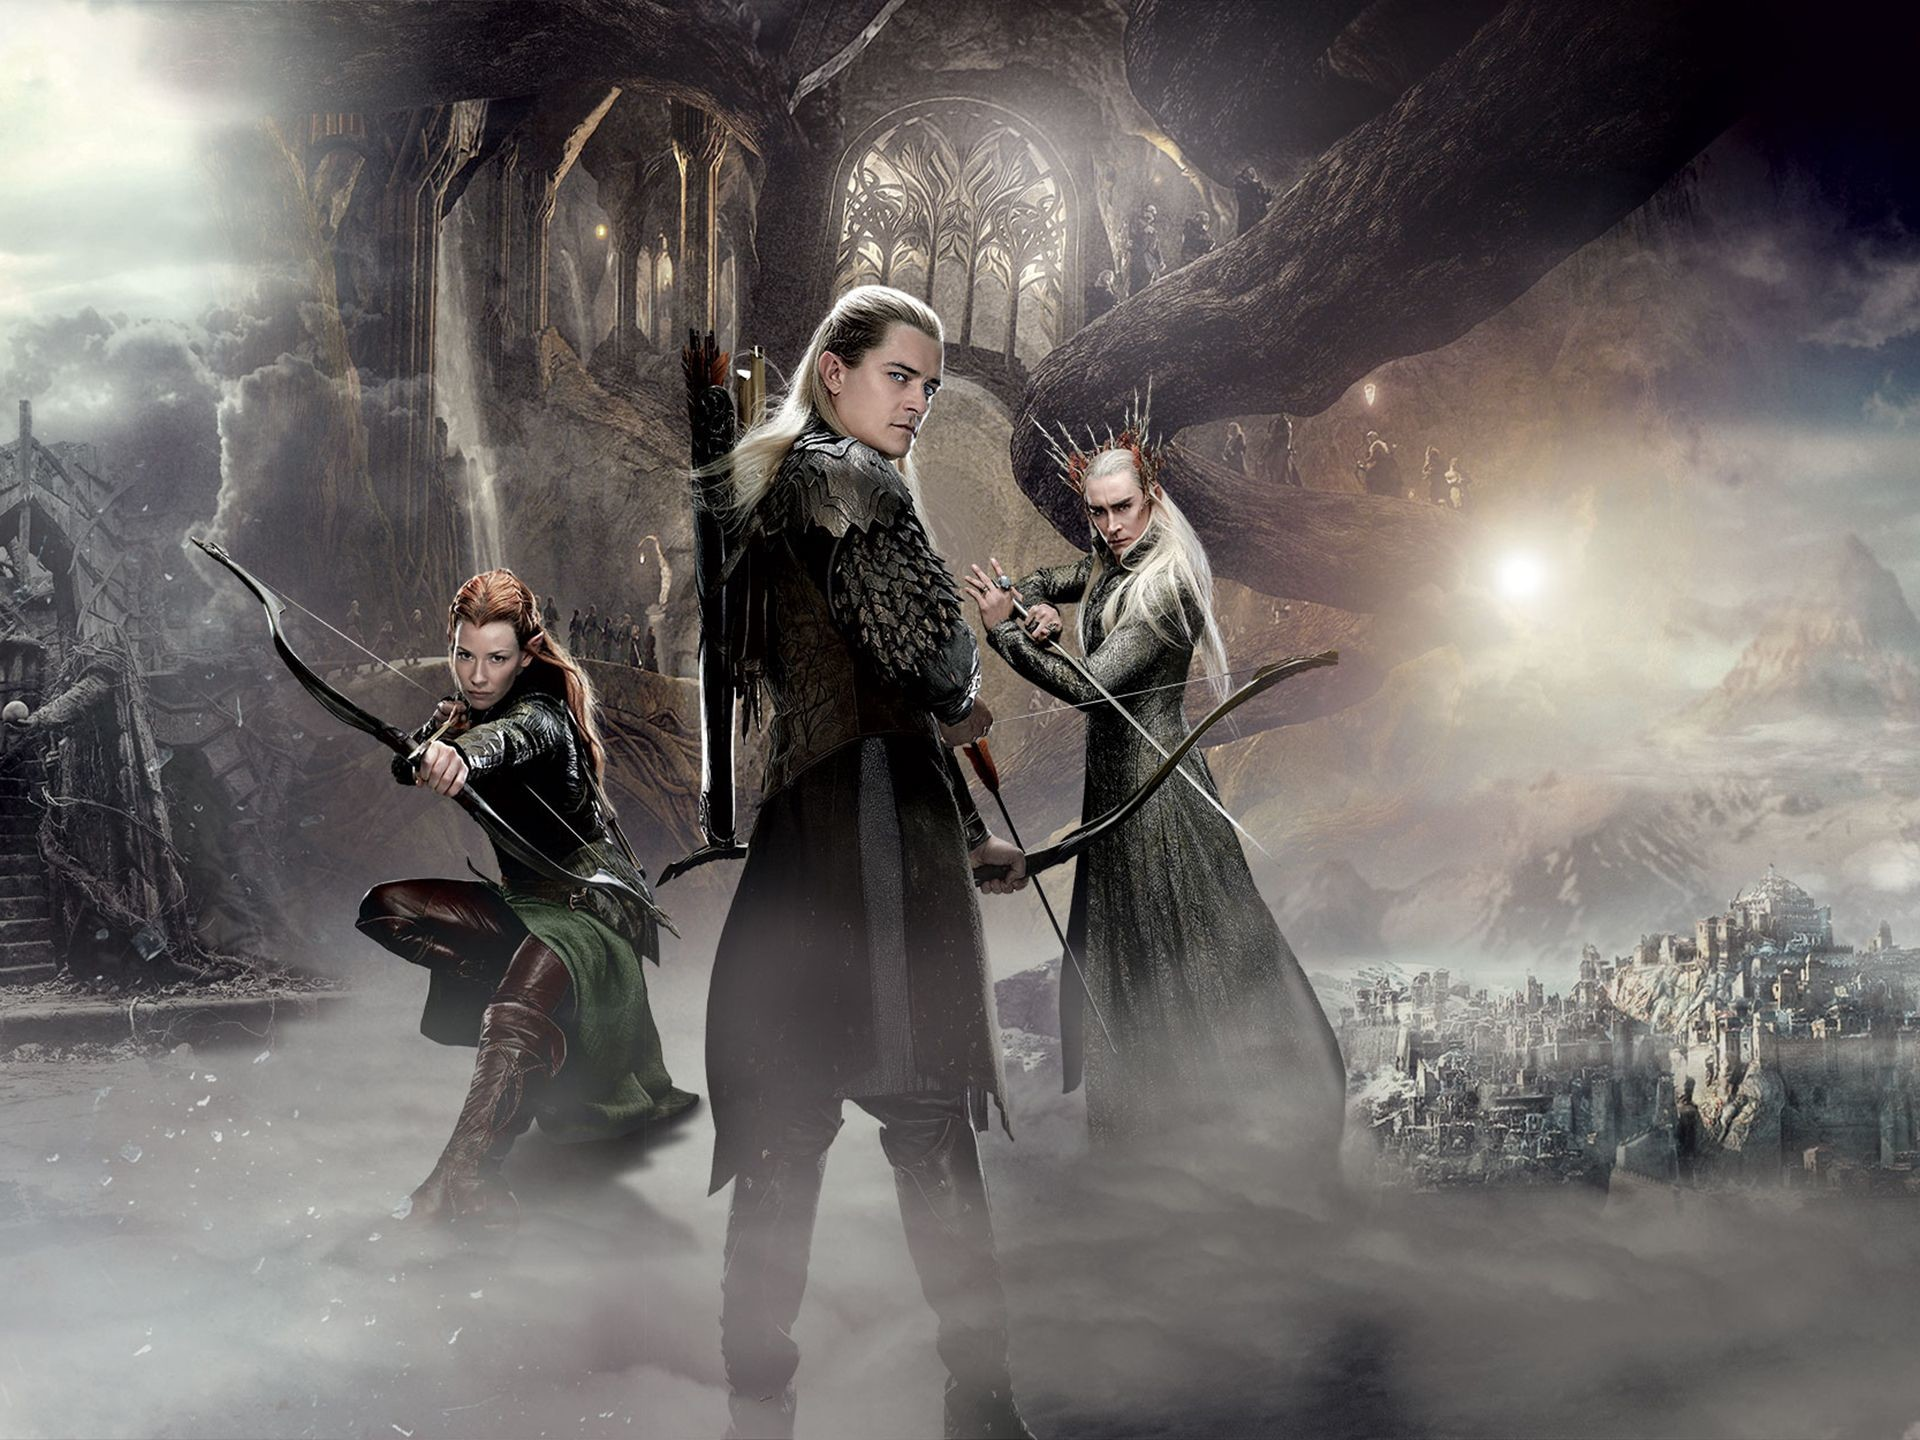 The Hobbit – The Desolation of Smaug (6)